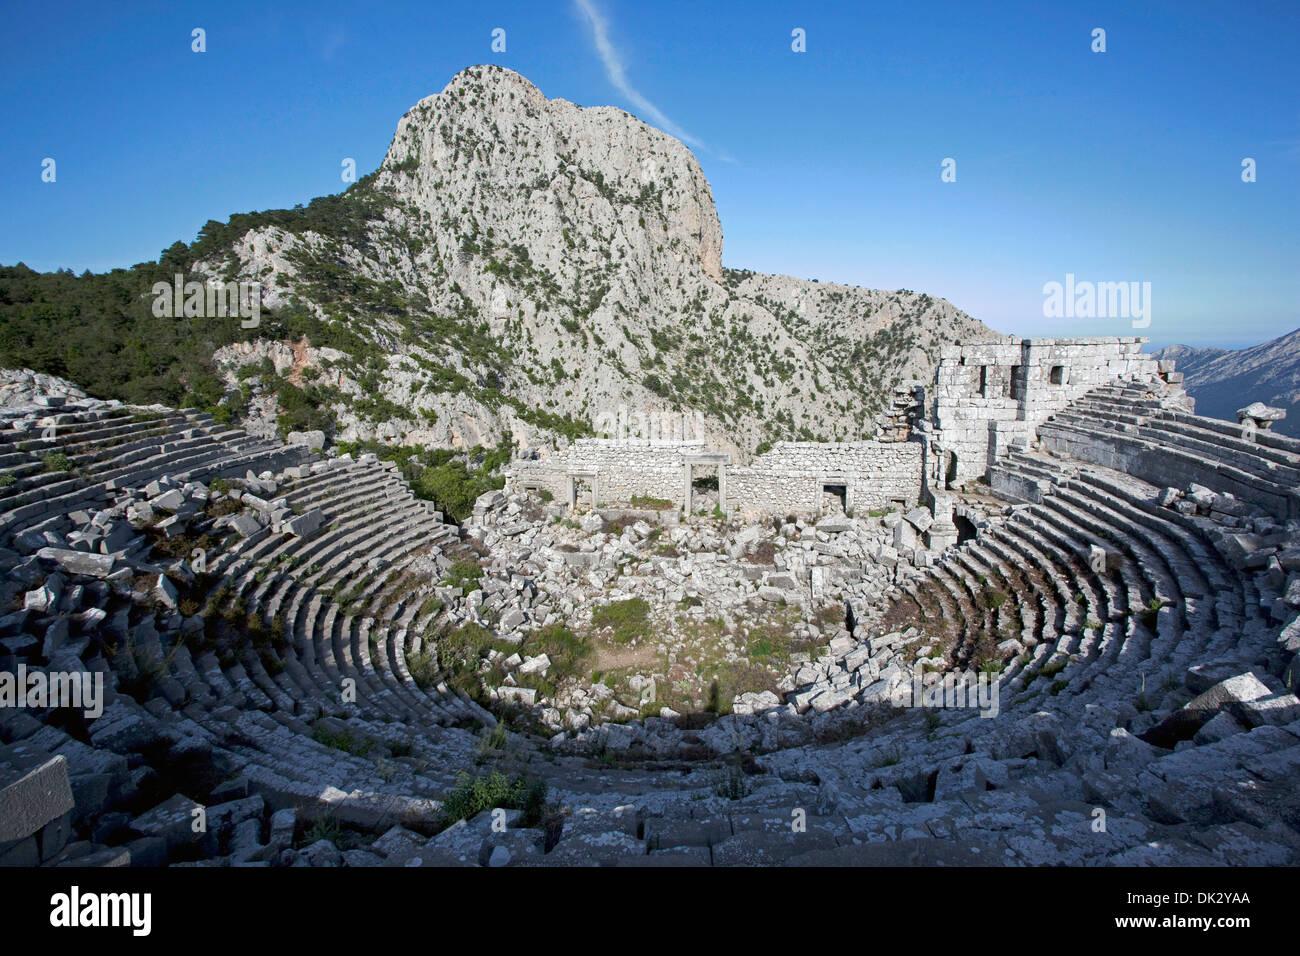 Termessos ancient city amphitheatre, Antalya Turkey Stock ...